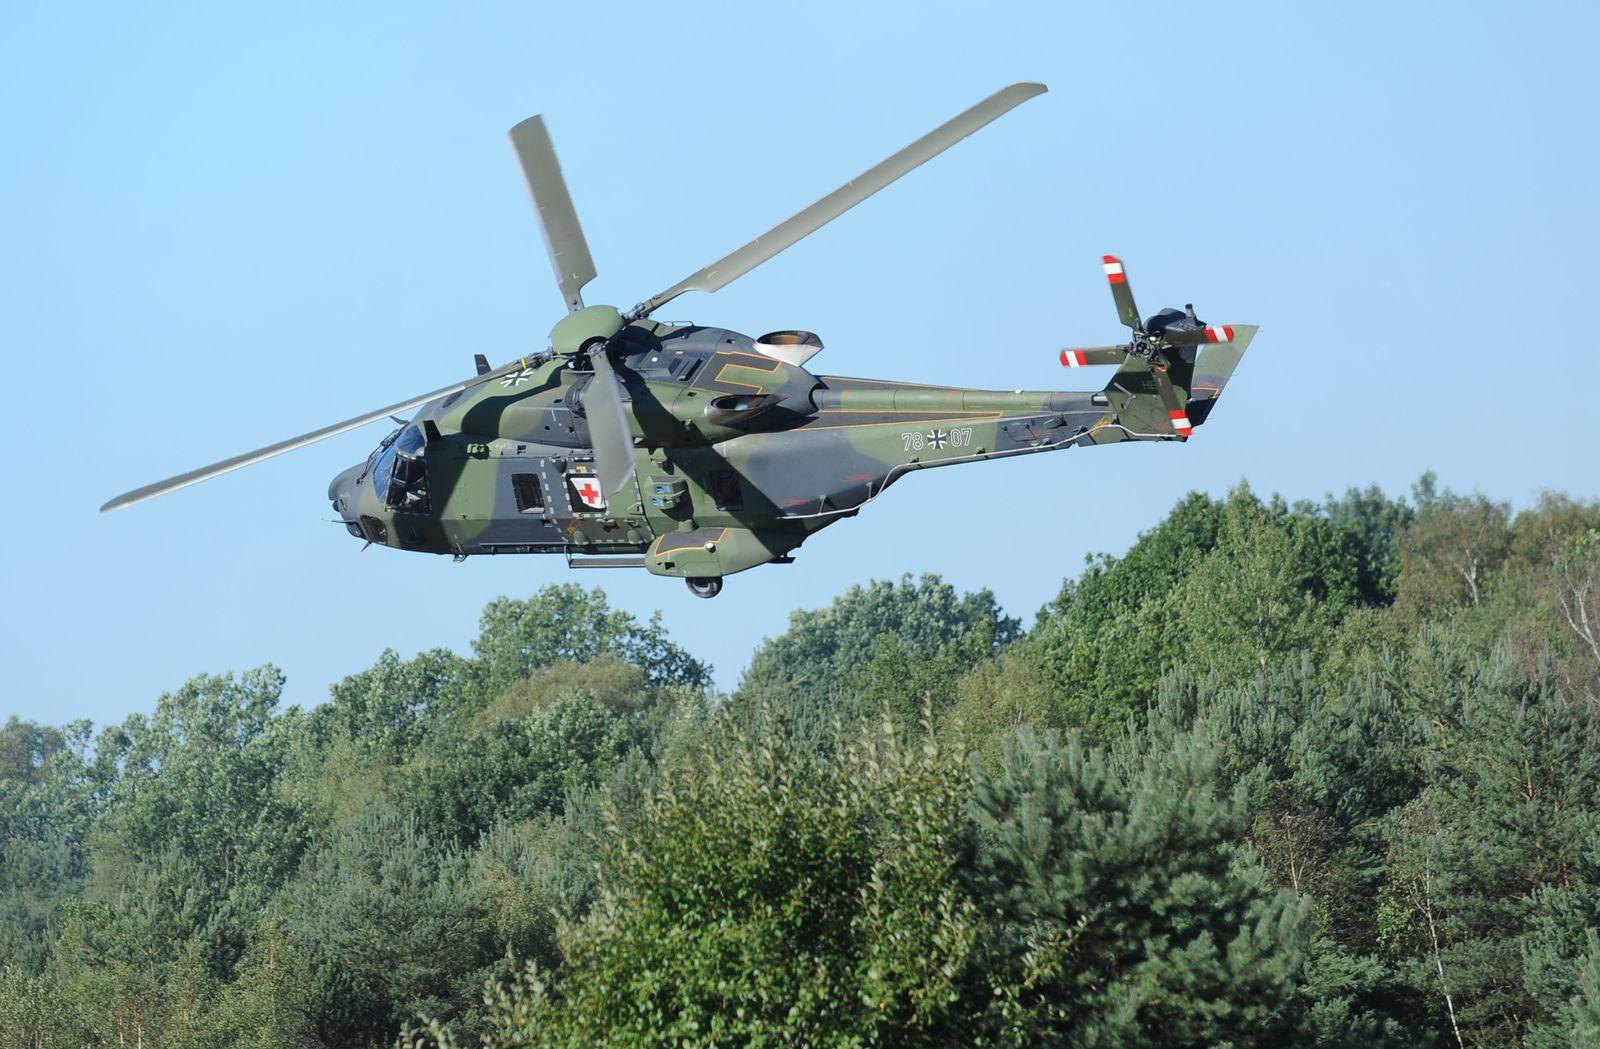 Hubschrauber NH90